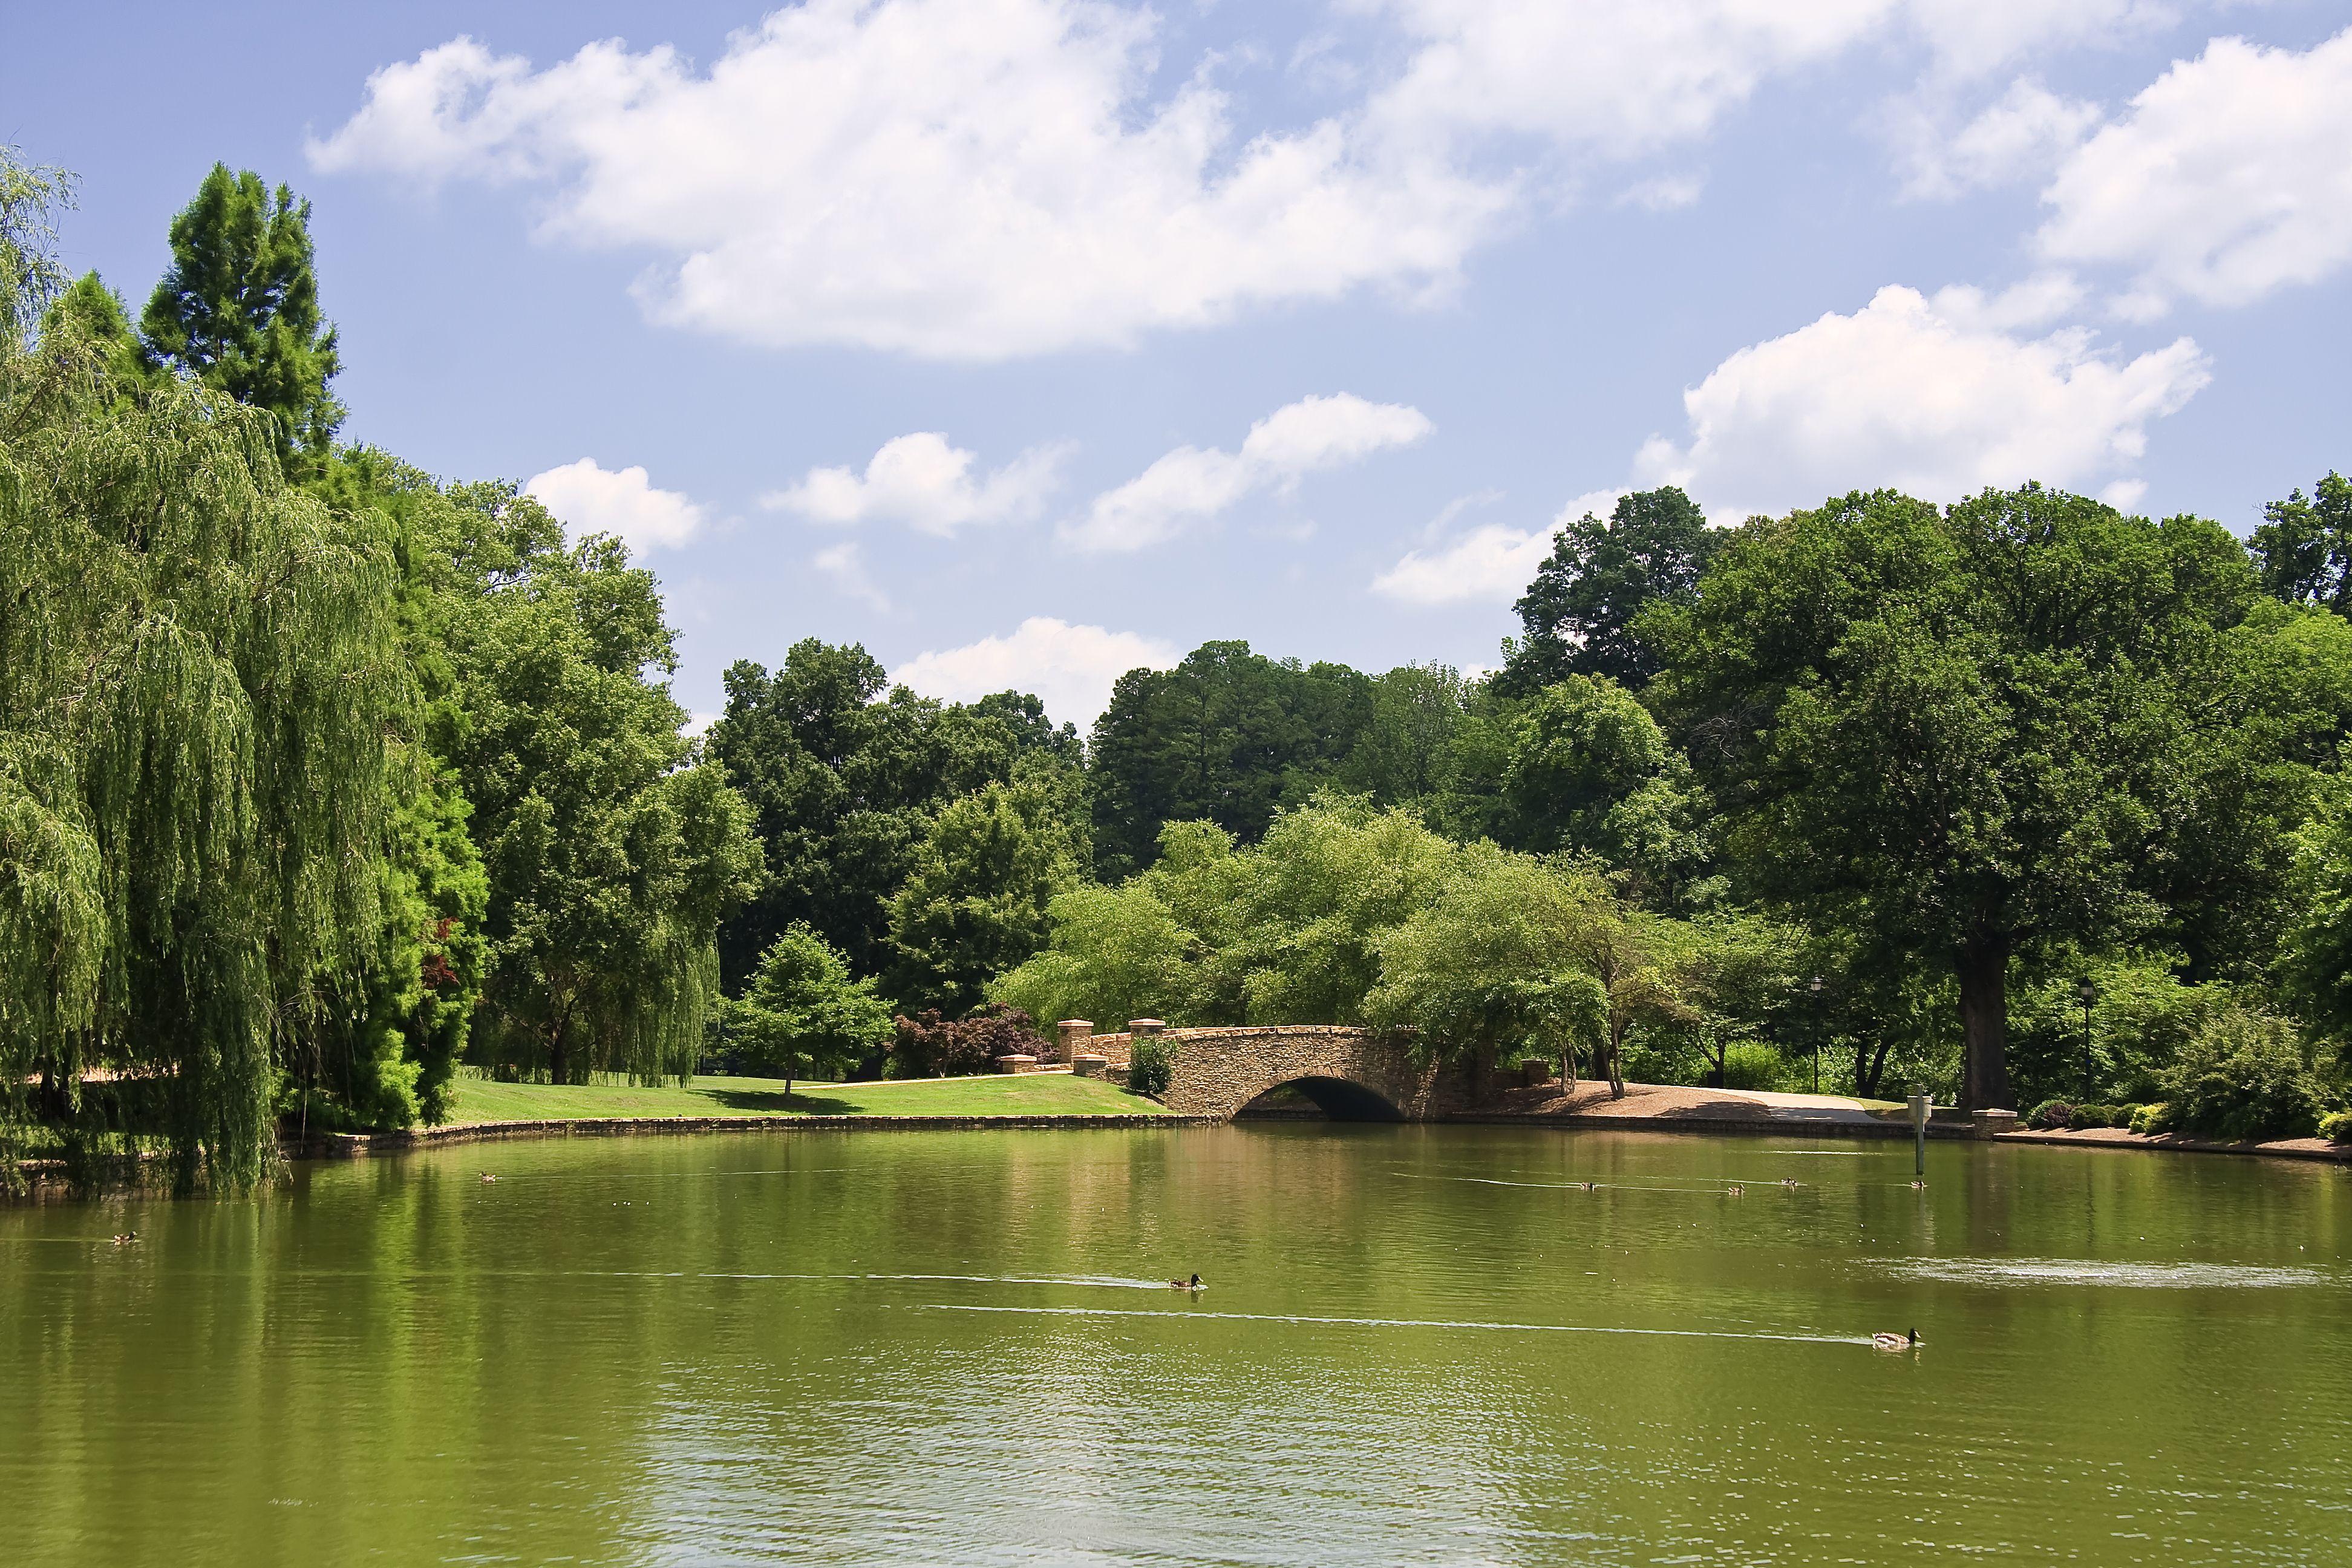 North Carolina Usda Plant Hardiness Zones